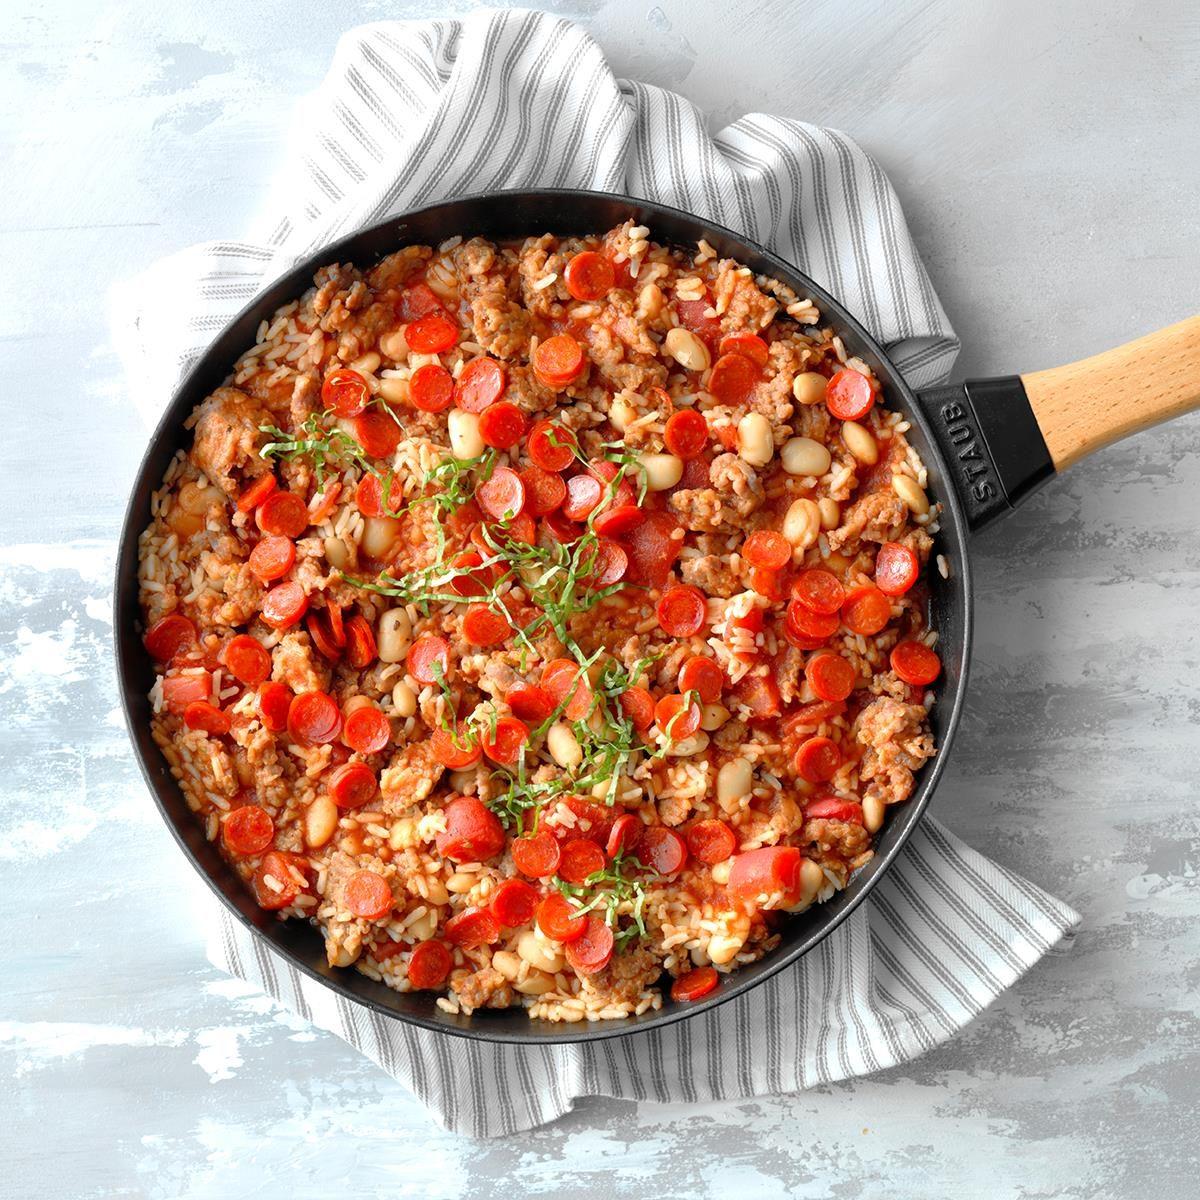 Meat Lover S Pizza Rice Skillet Exps Sdas18 214139 D03 28  7b 7